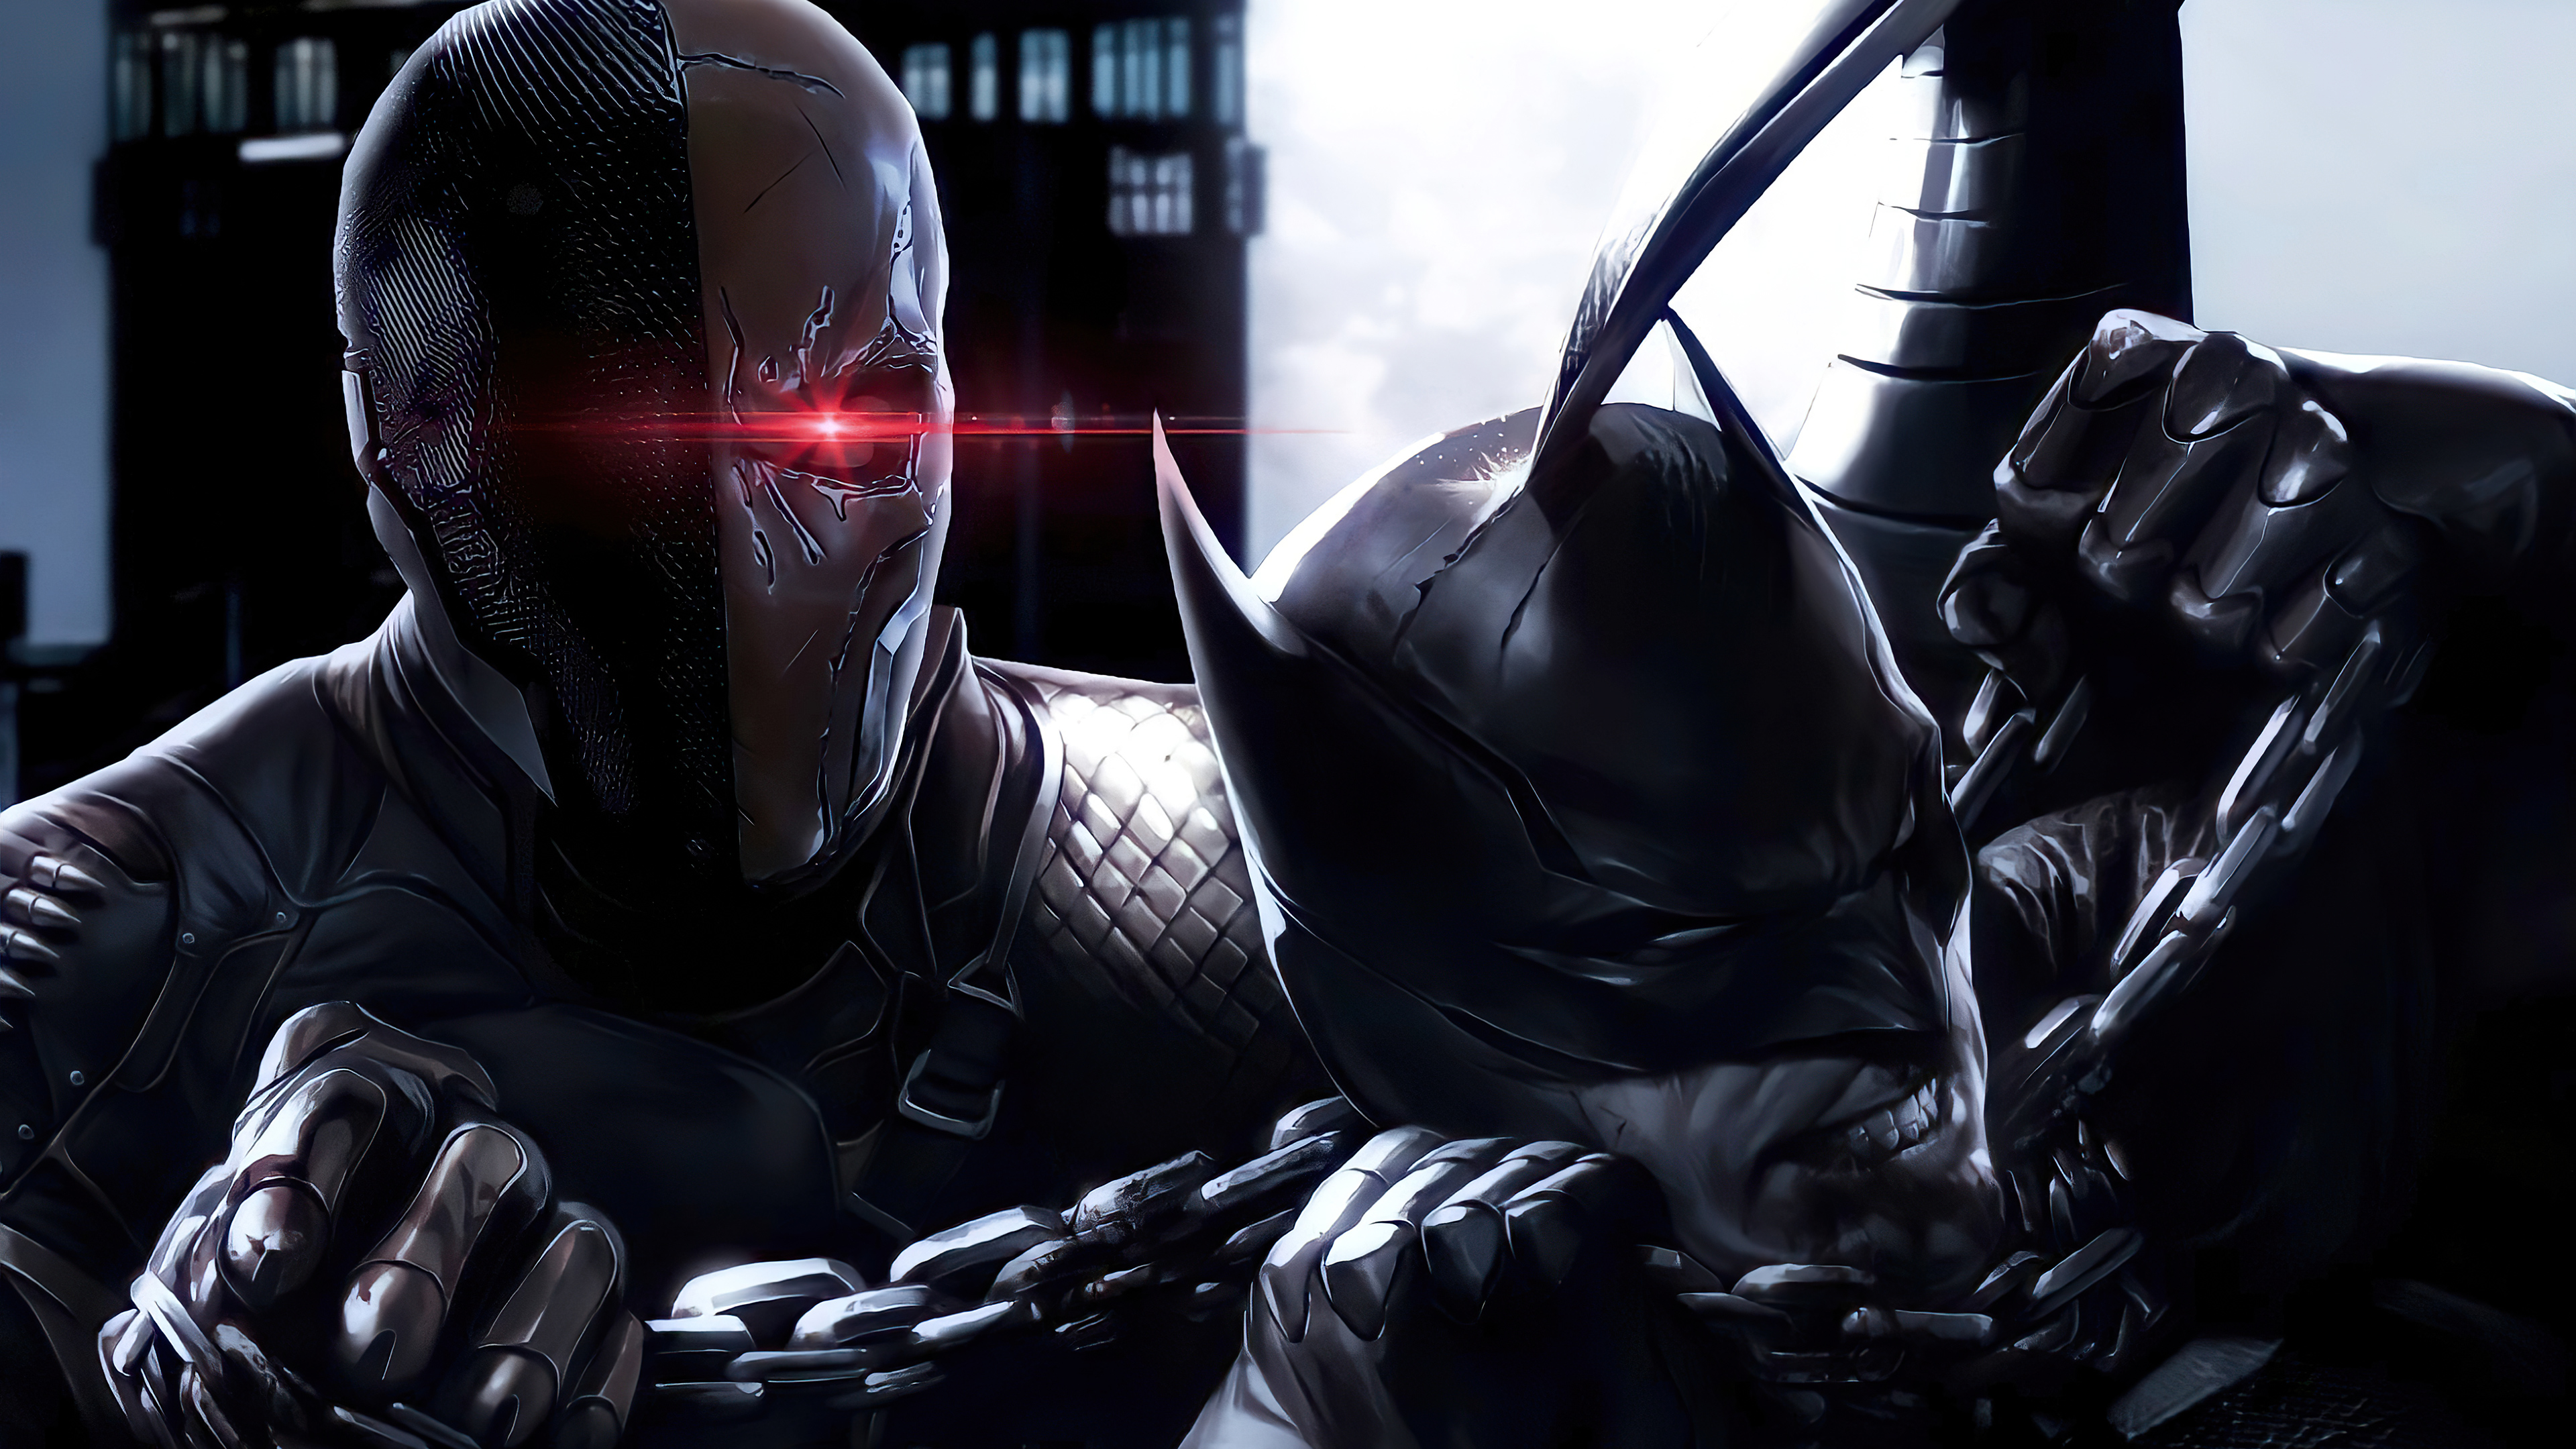 batman v deathstroke 4k 1616956386 - Batman V Deathstroke 4k - Batman V Deathstroke 4k wallpapers